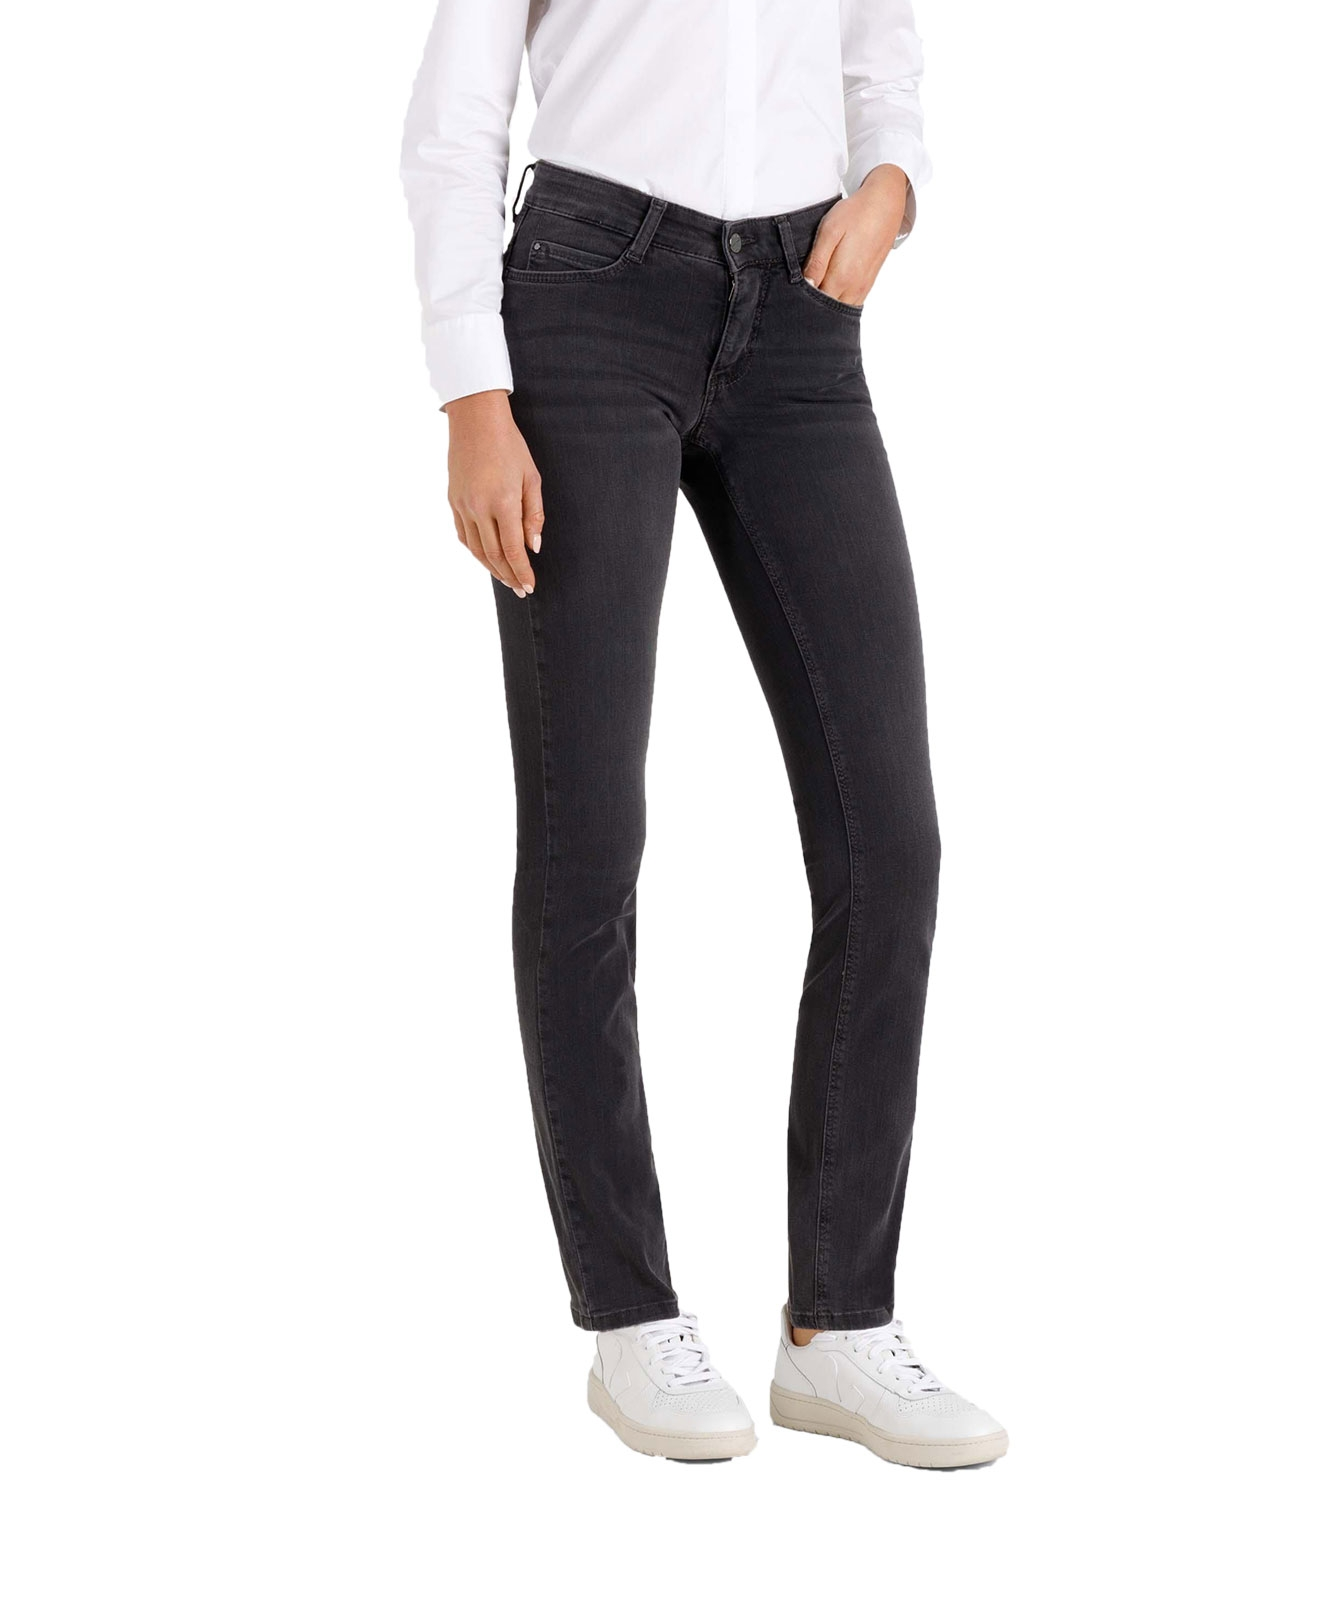 Hosen - MAC Straight Leg Jeans Dream in Dark Grey Used Wash  - Onlineshop Jeans Meile